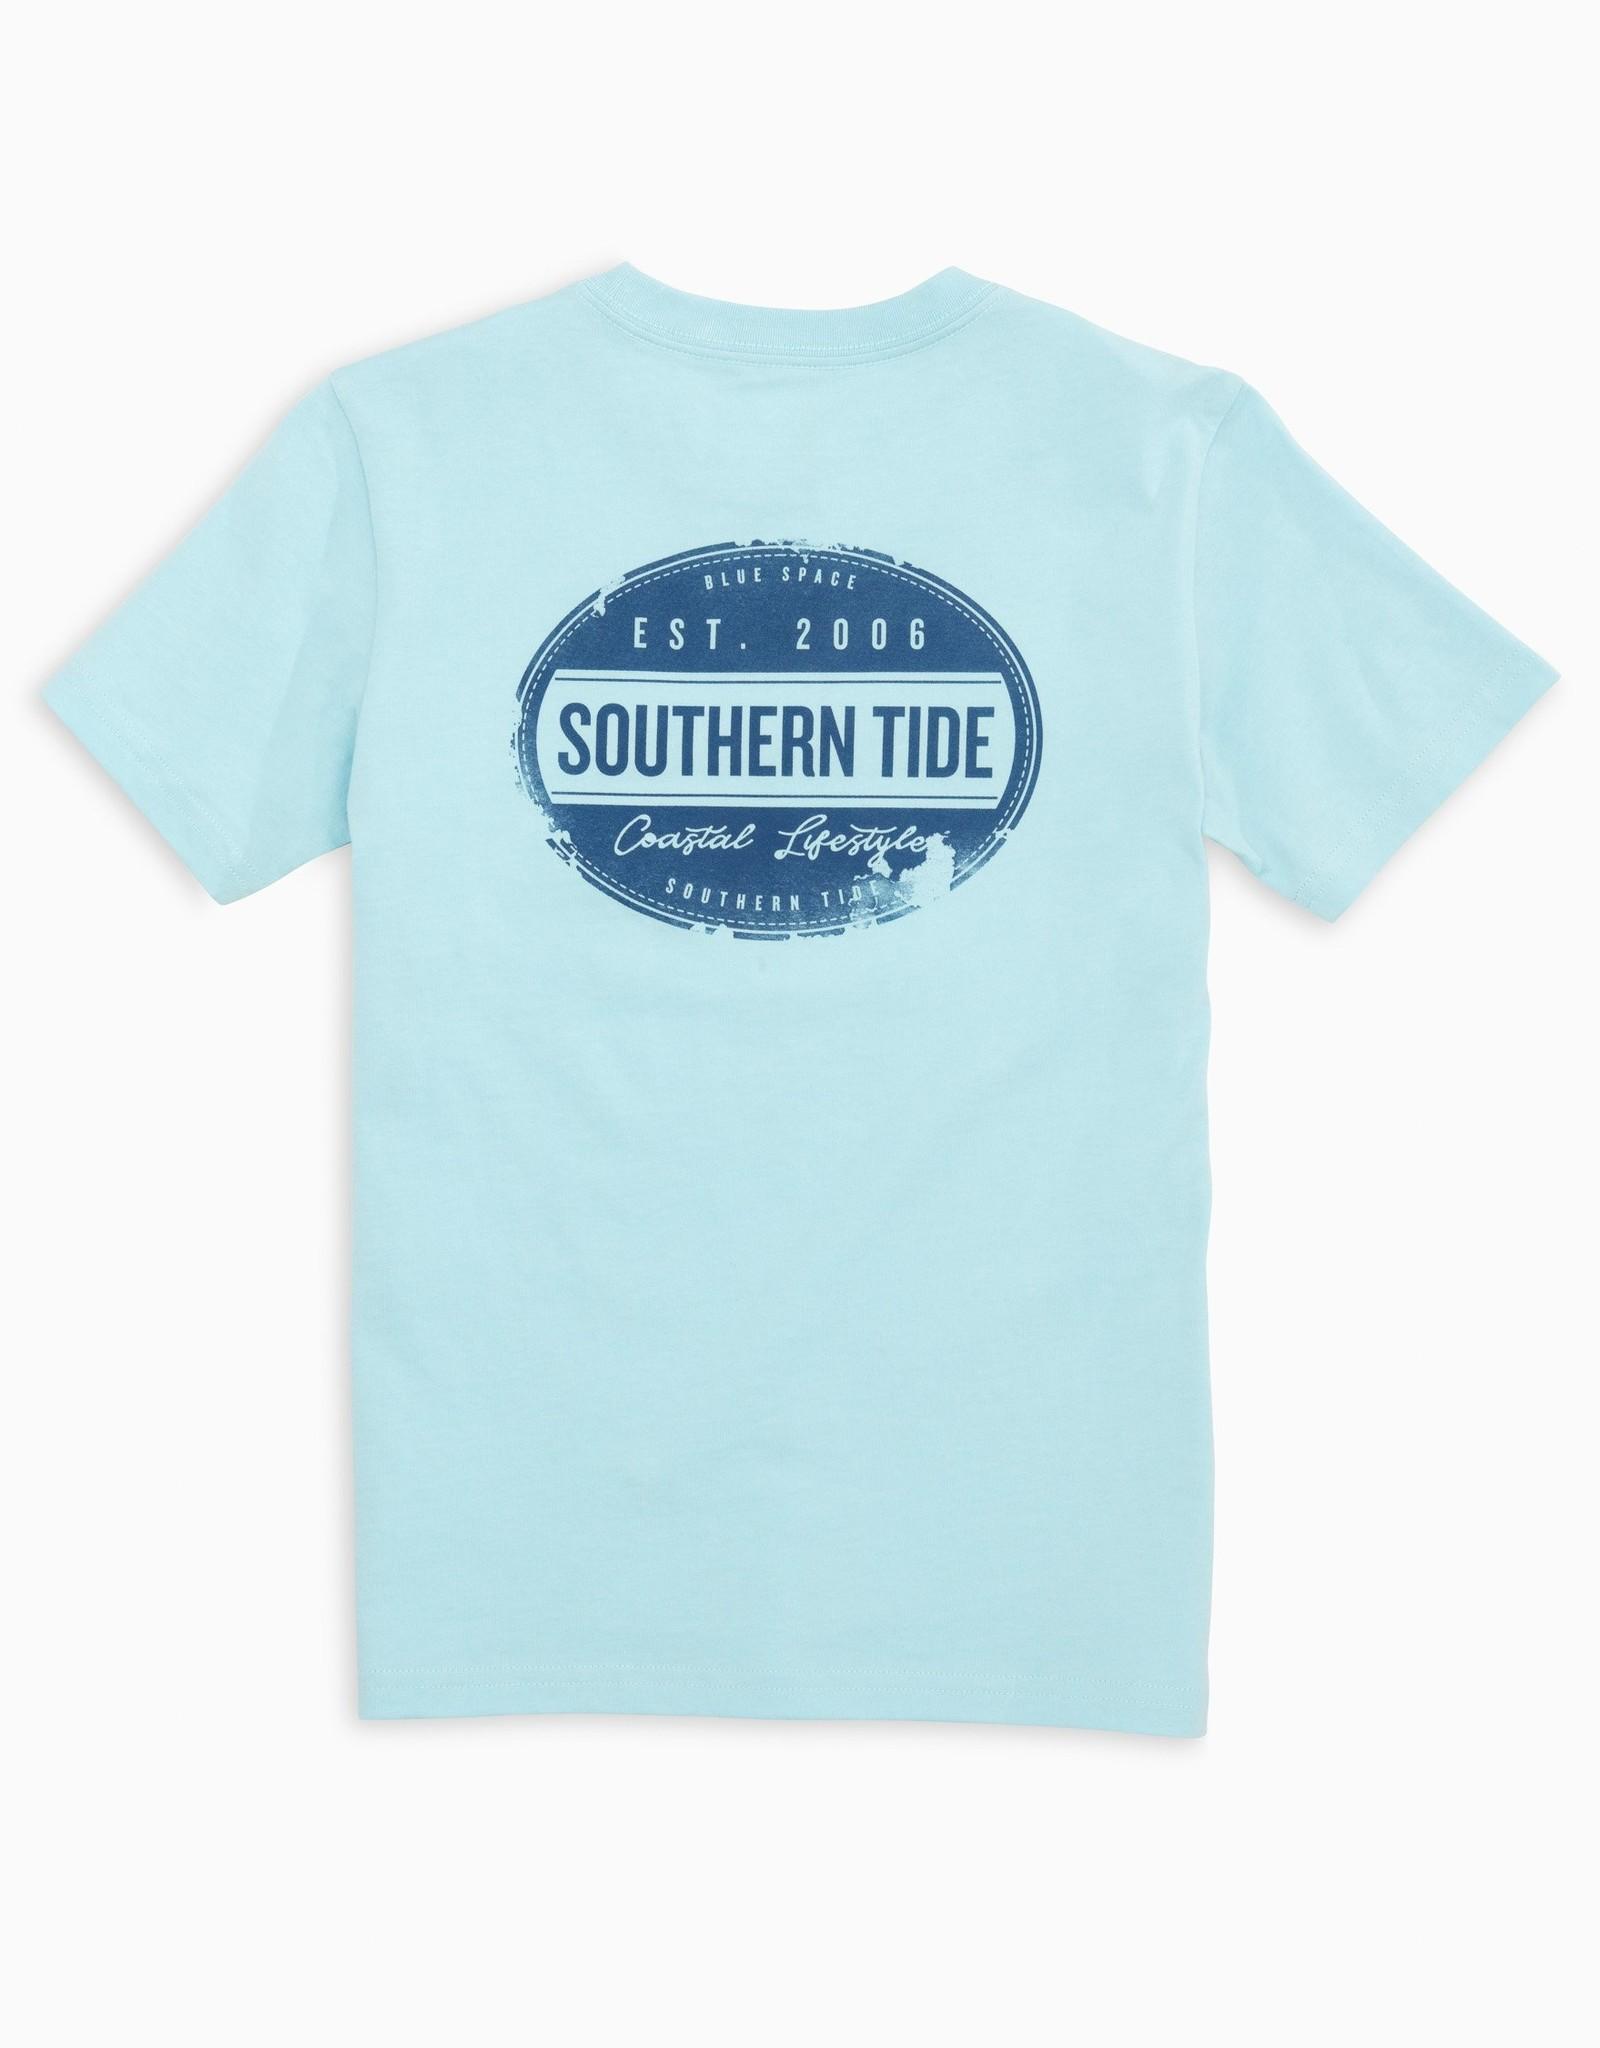 Southern Tide Yth Coastal Lifestyle Shirt